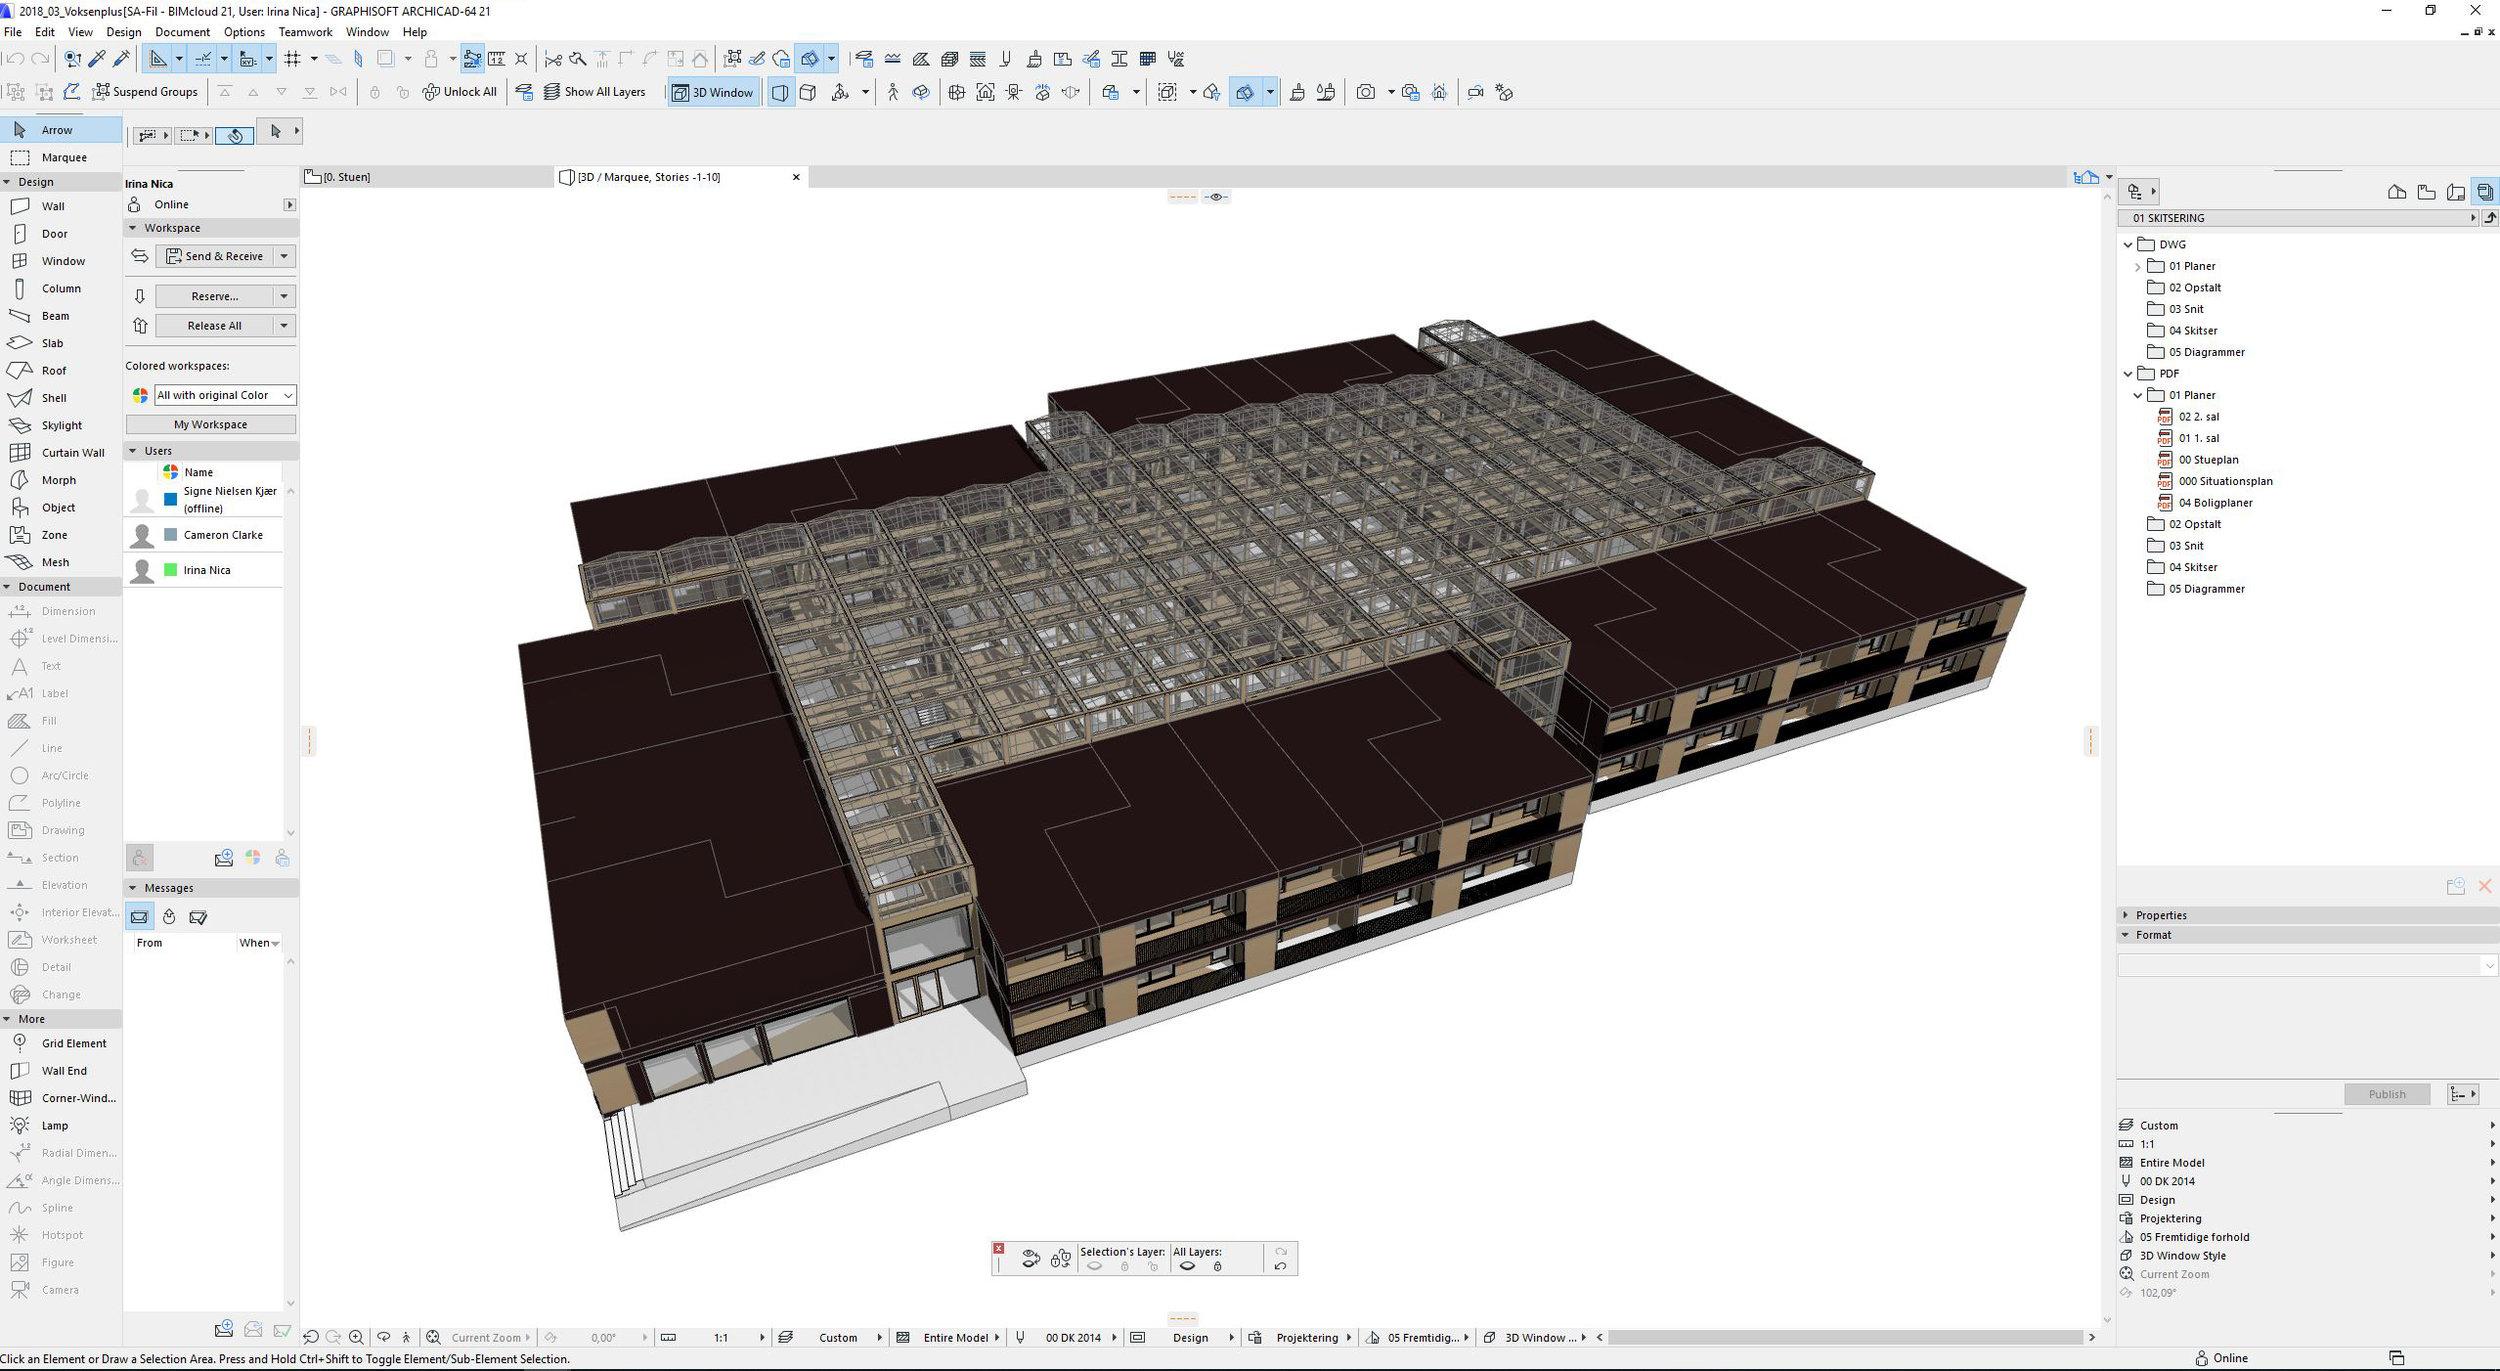 Sangberg-BIM-E-VoksenPlus-01-ARCHICAD_edit-1.jpg